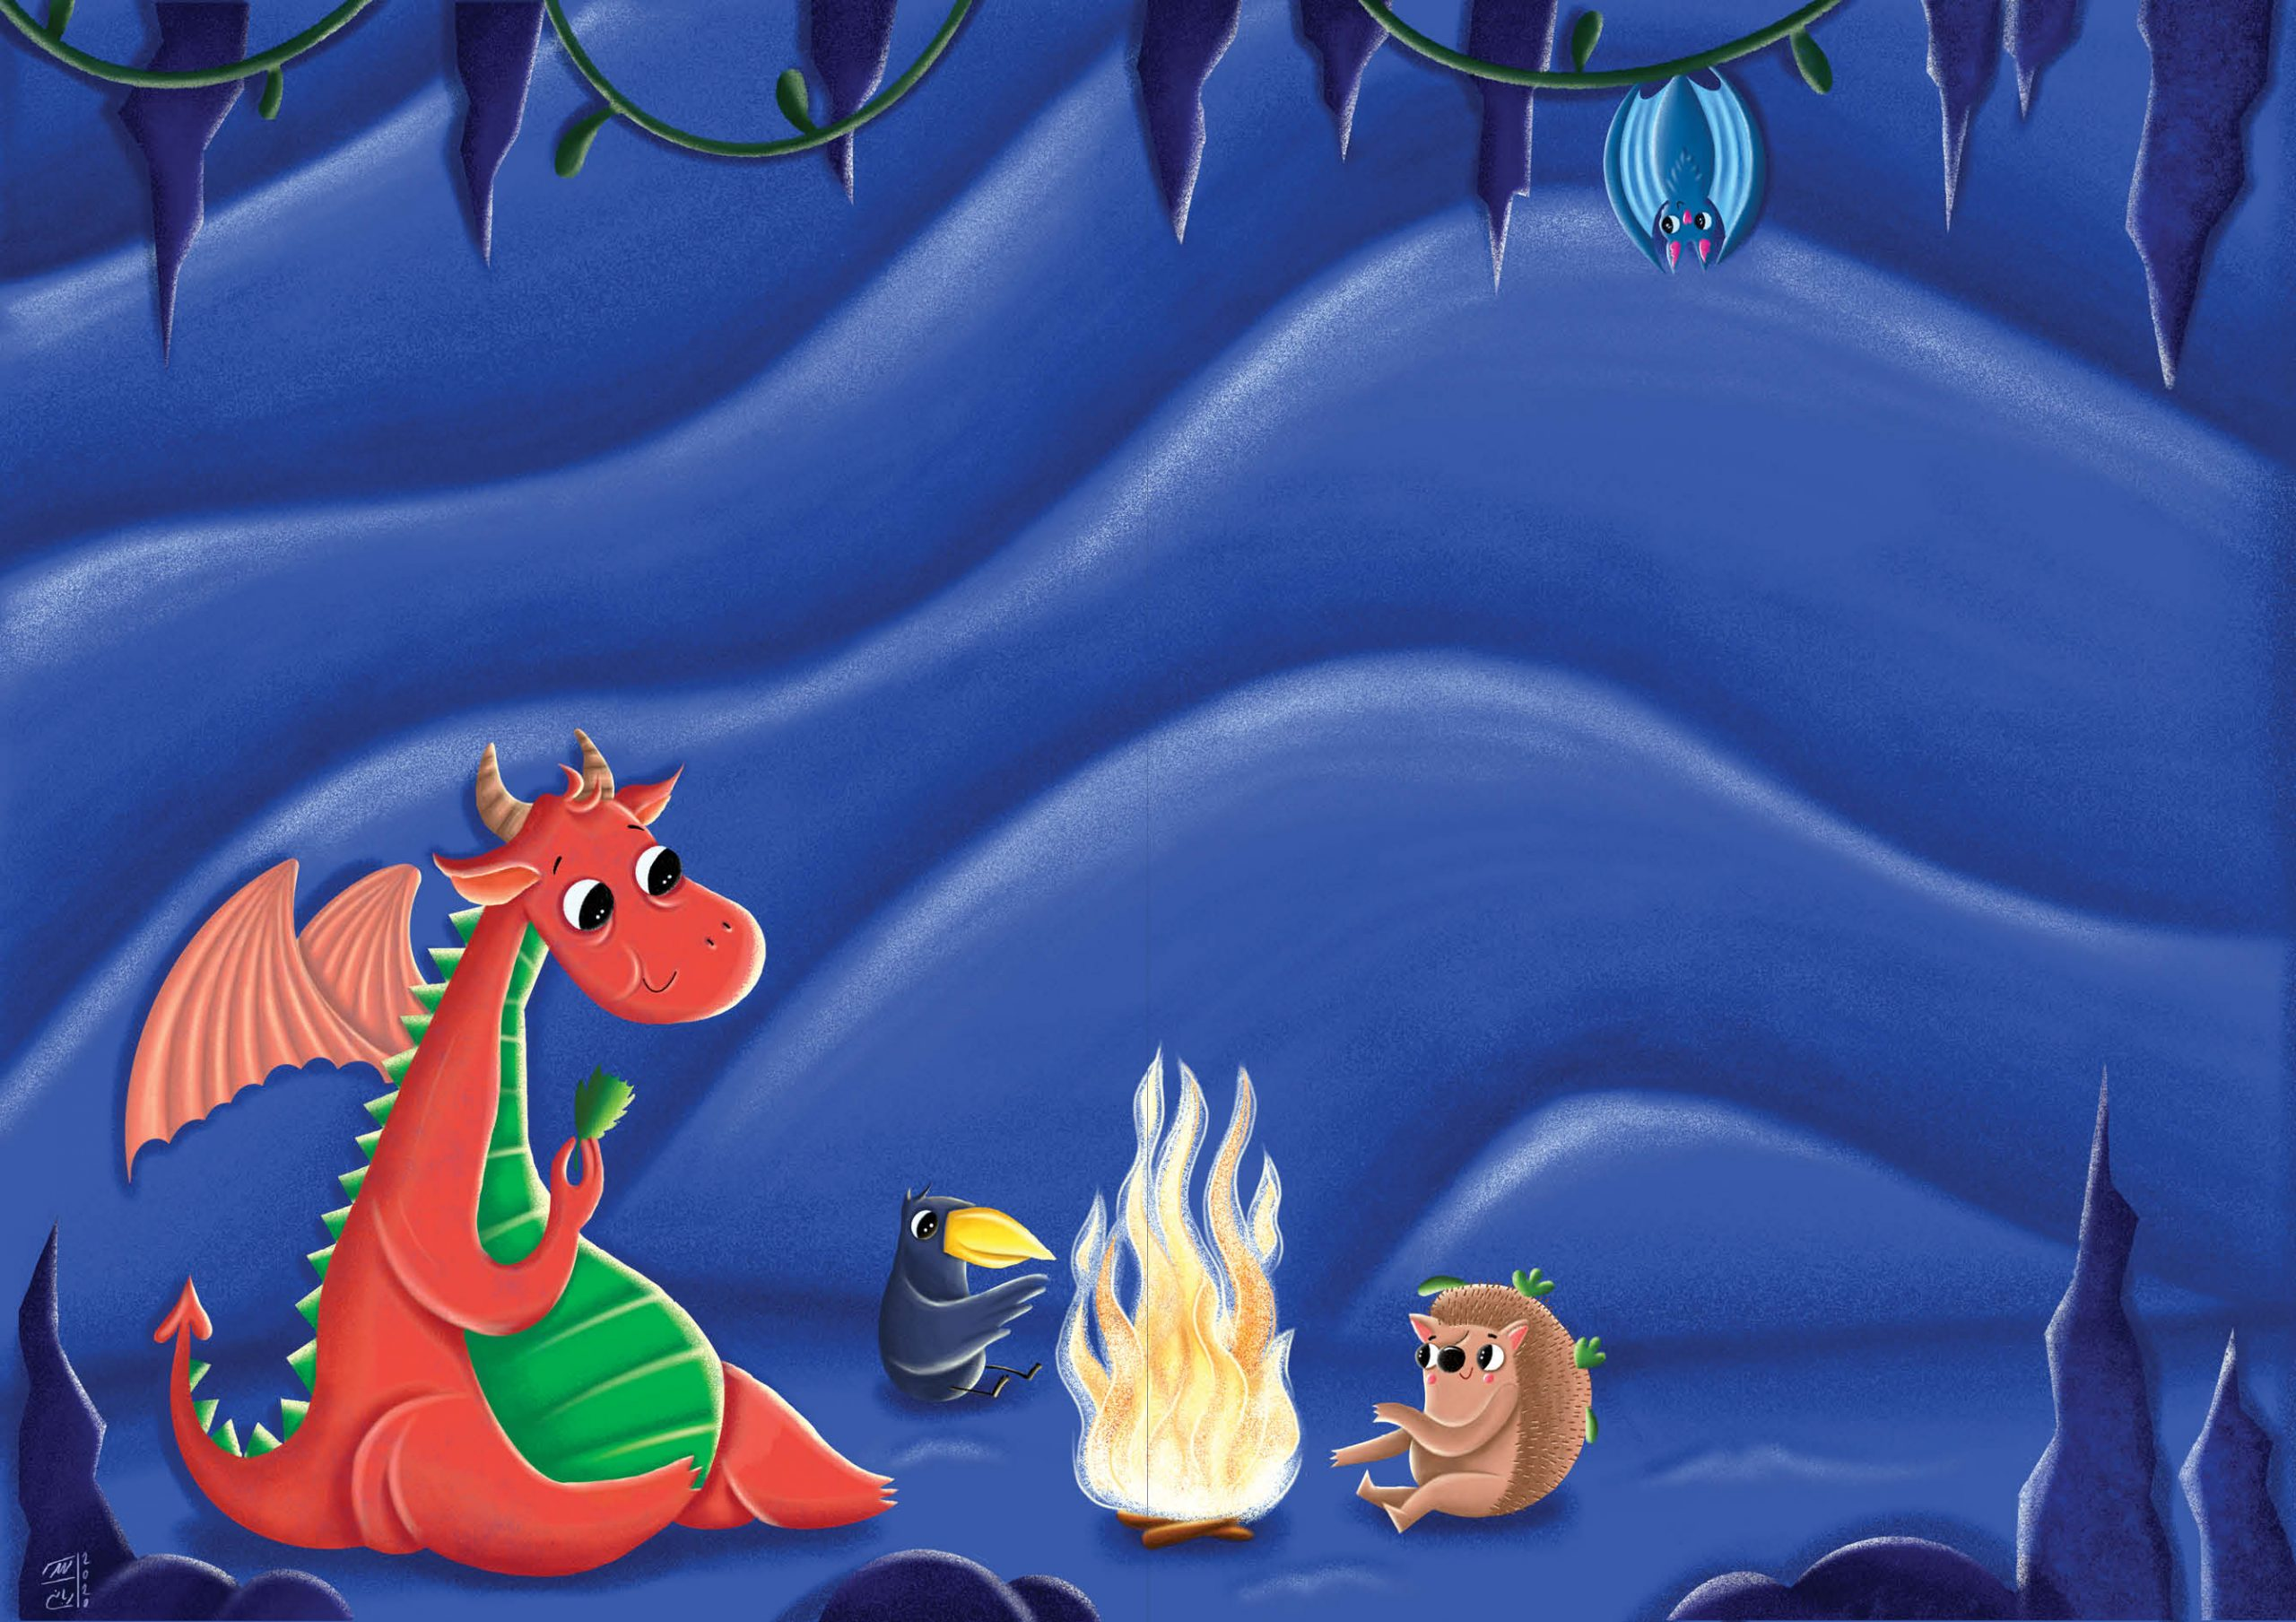 قصه کودکانه اژدها کوچولوی گرسنه